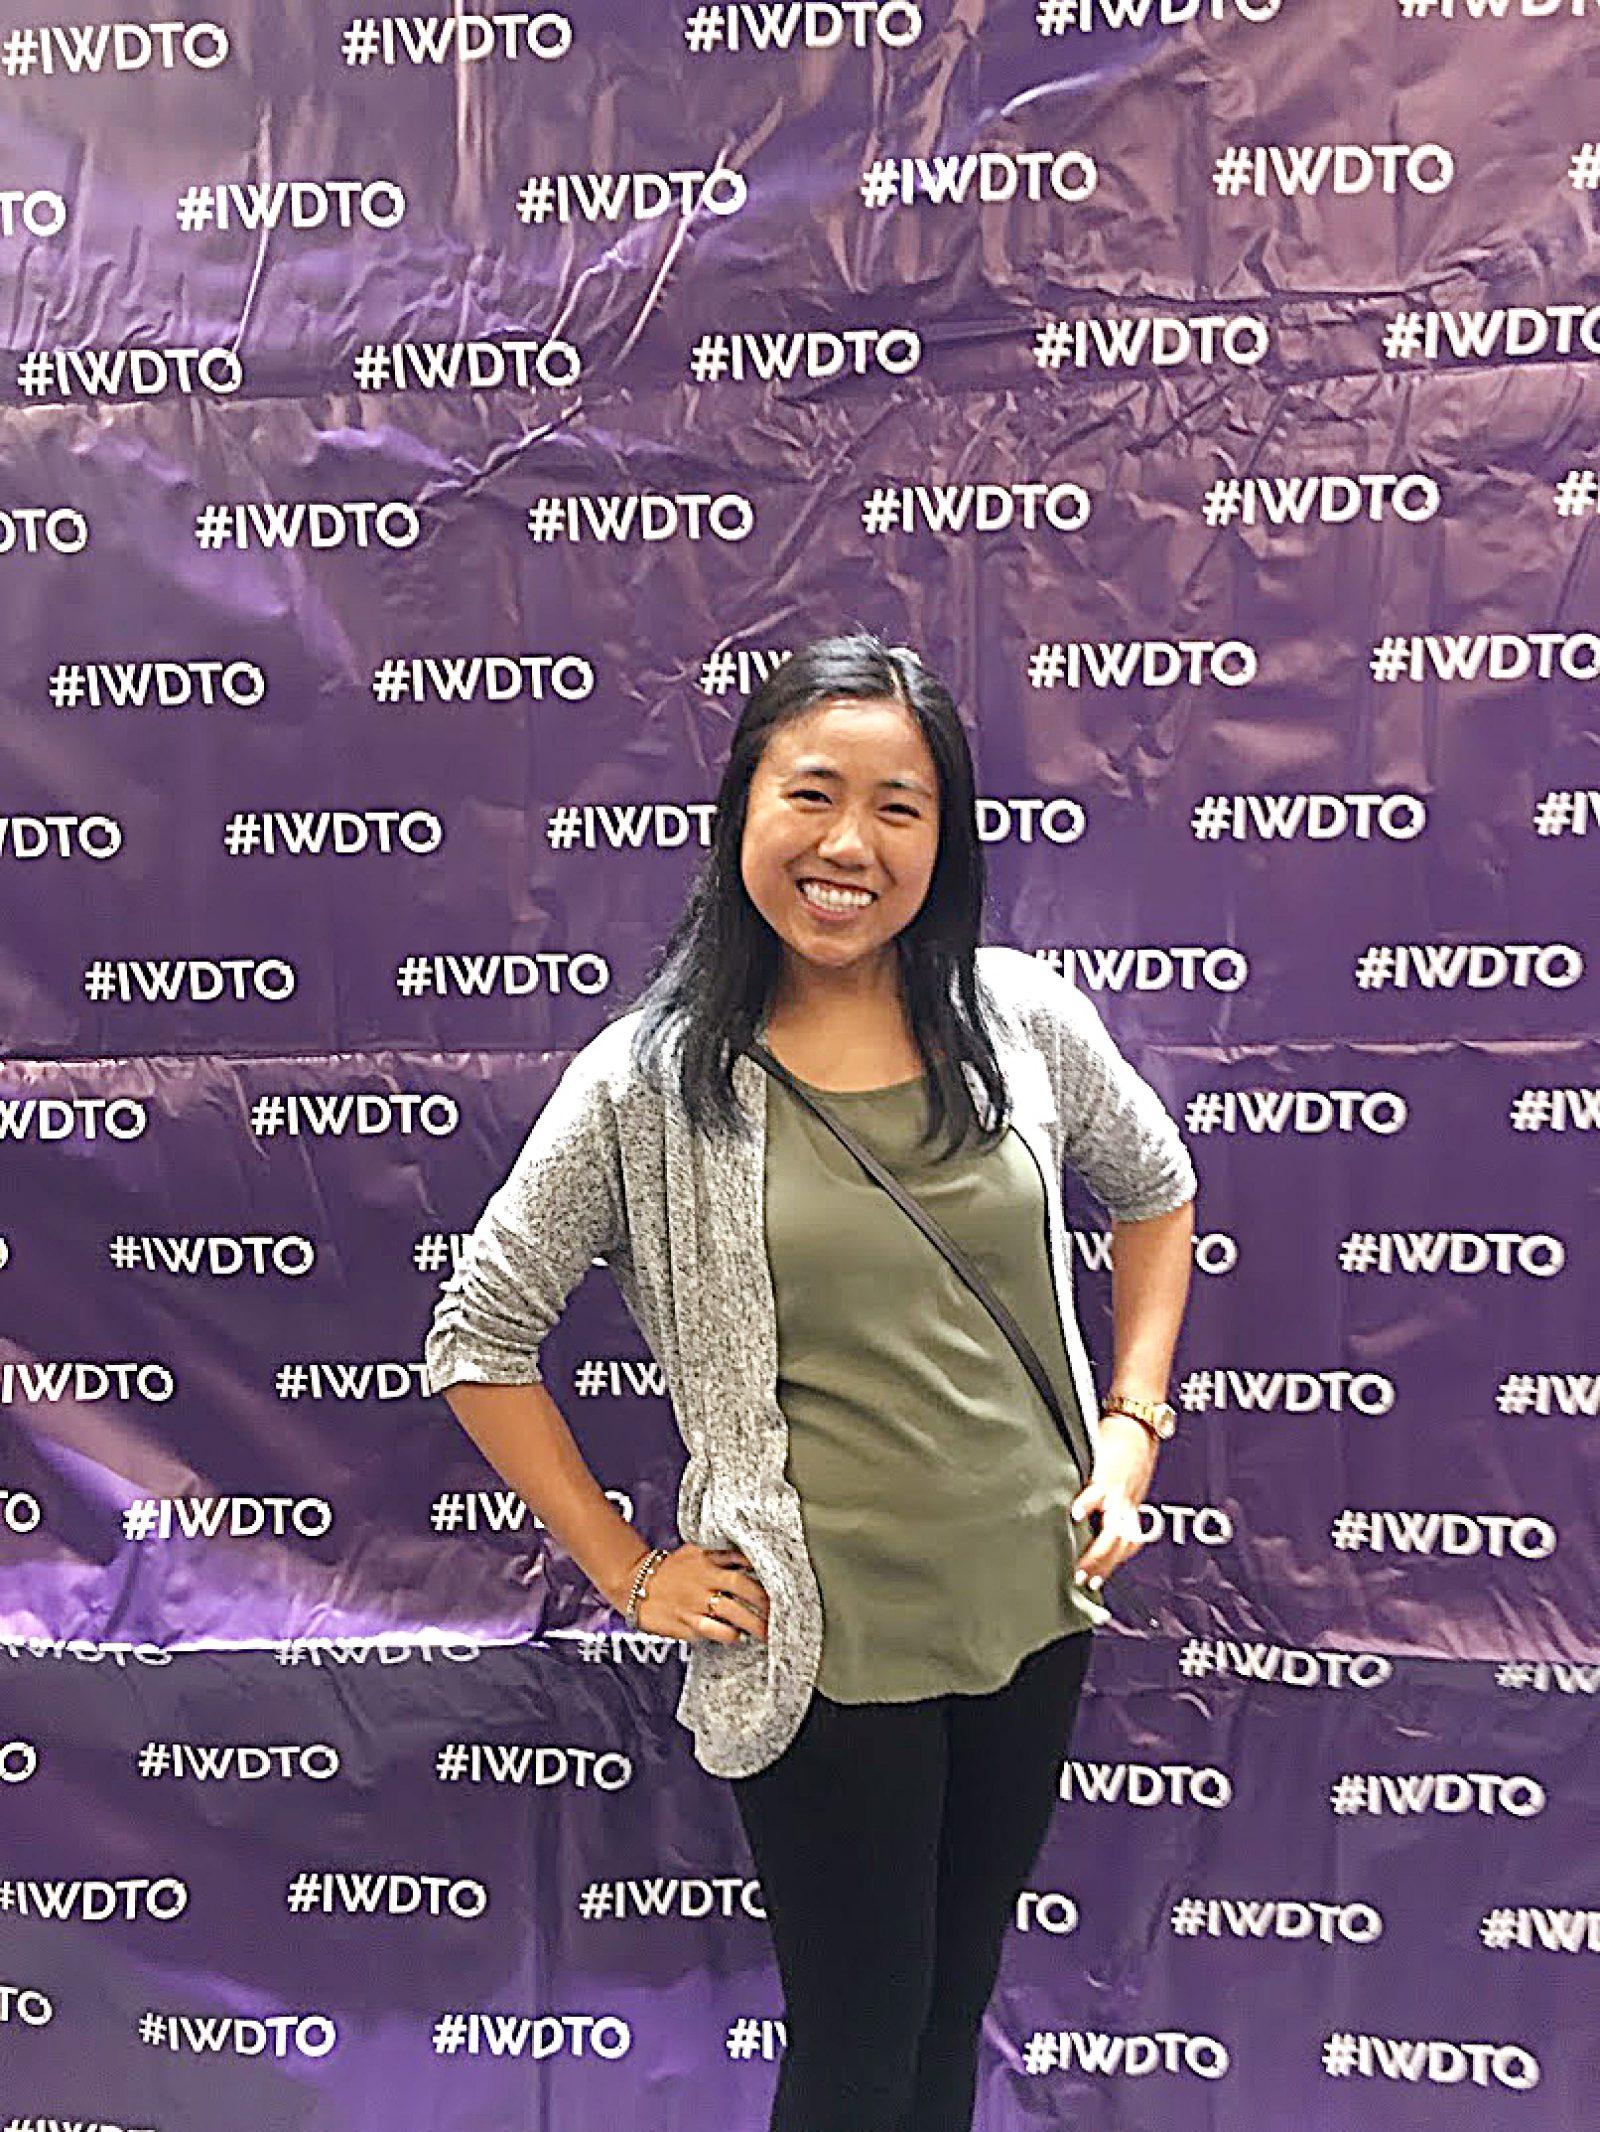 Jen Beltran, Full-Stack Web Development Student, at DevTo's #IWDTO event on March 4th, 2019